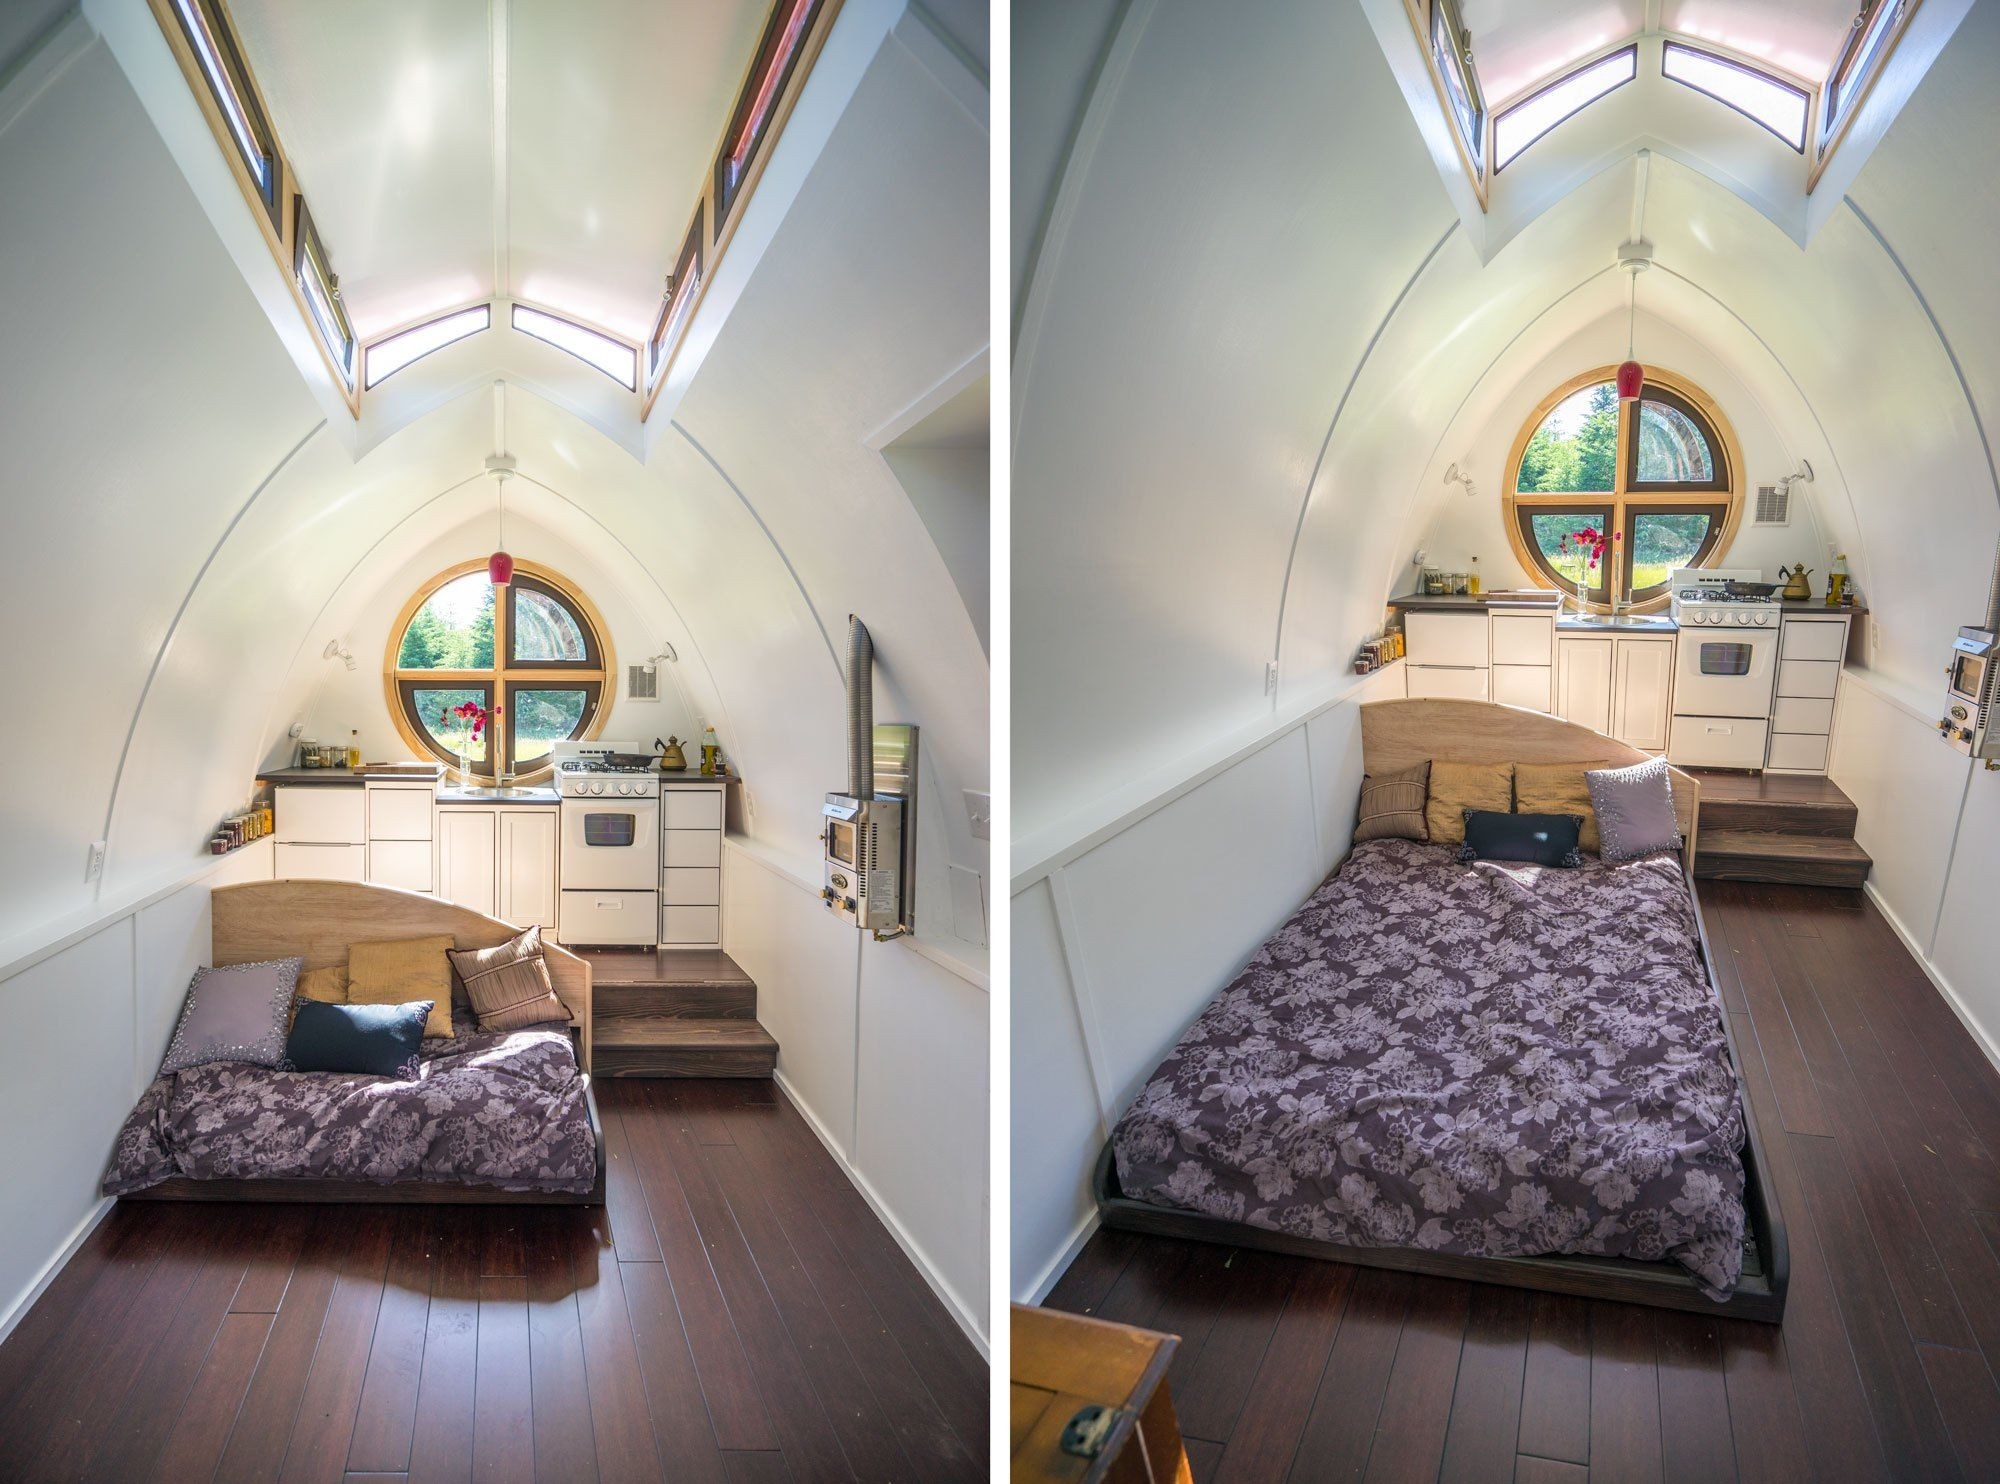 3 bedroom loft house  DewDropTinyHousePullOutBed  tiny loft spaces